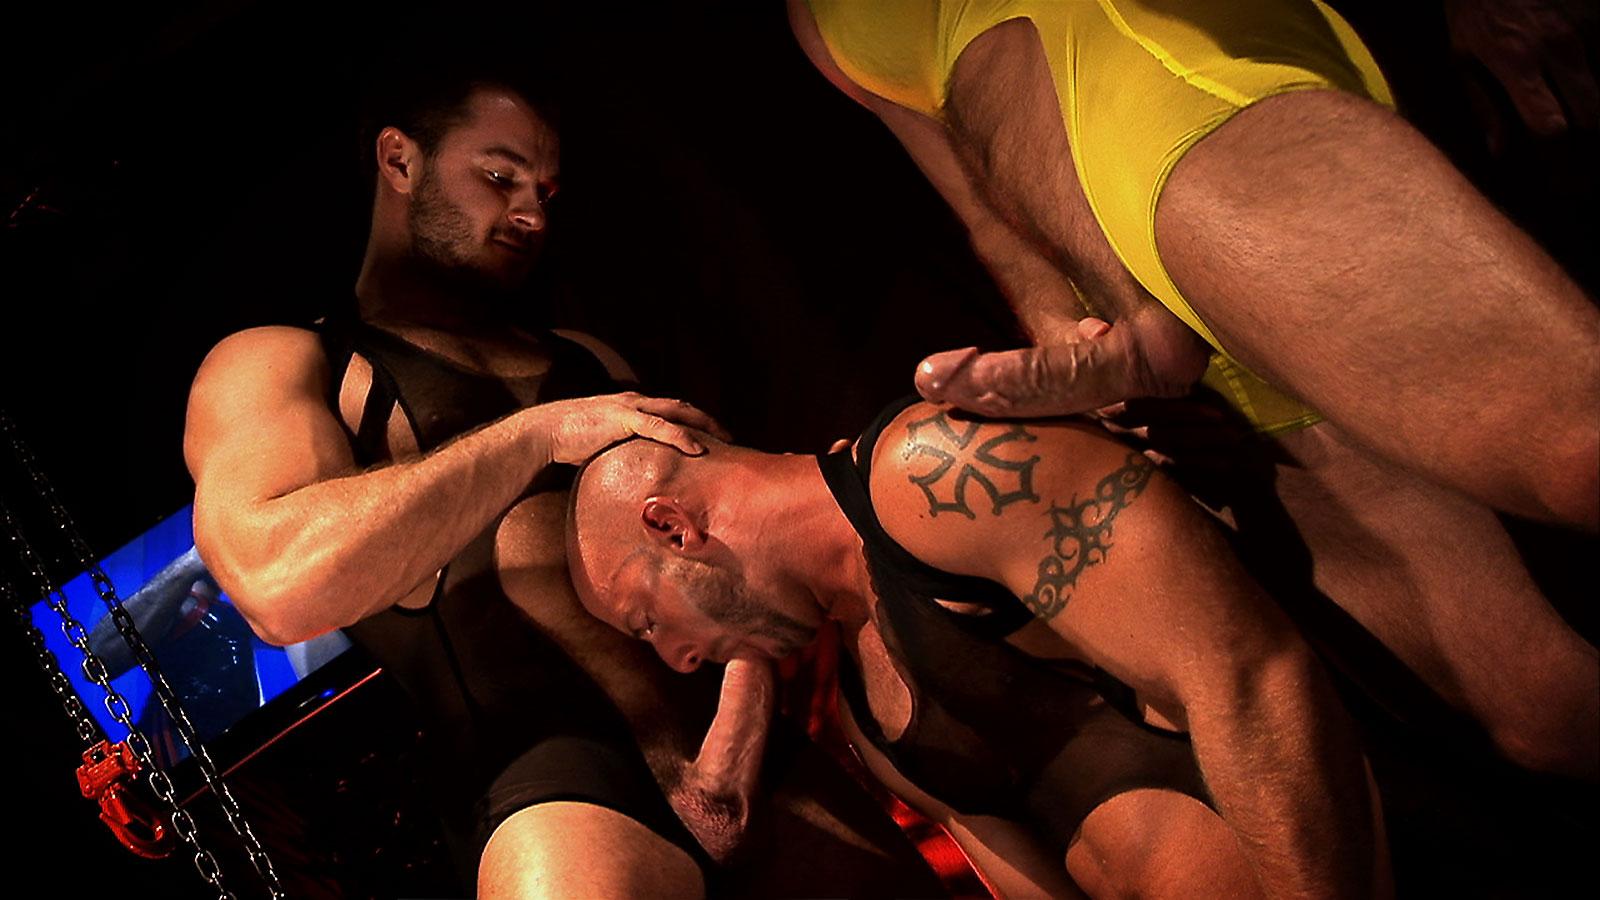 Nude sisters tube erotic image